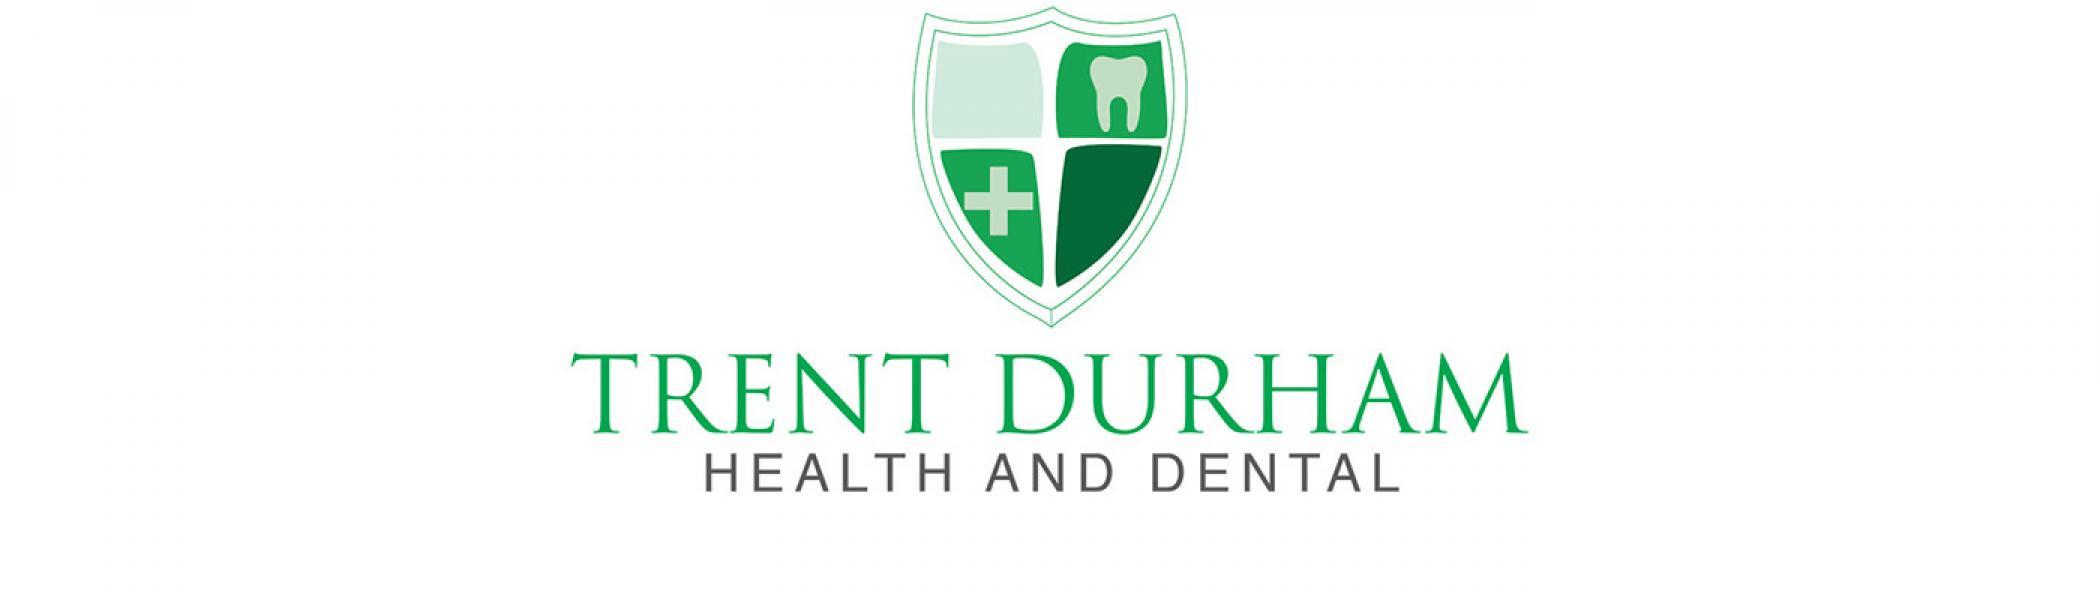 Trent Durham Health and Dental logo on the white background